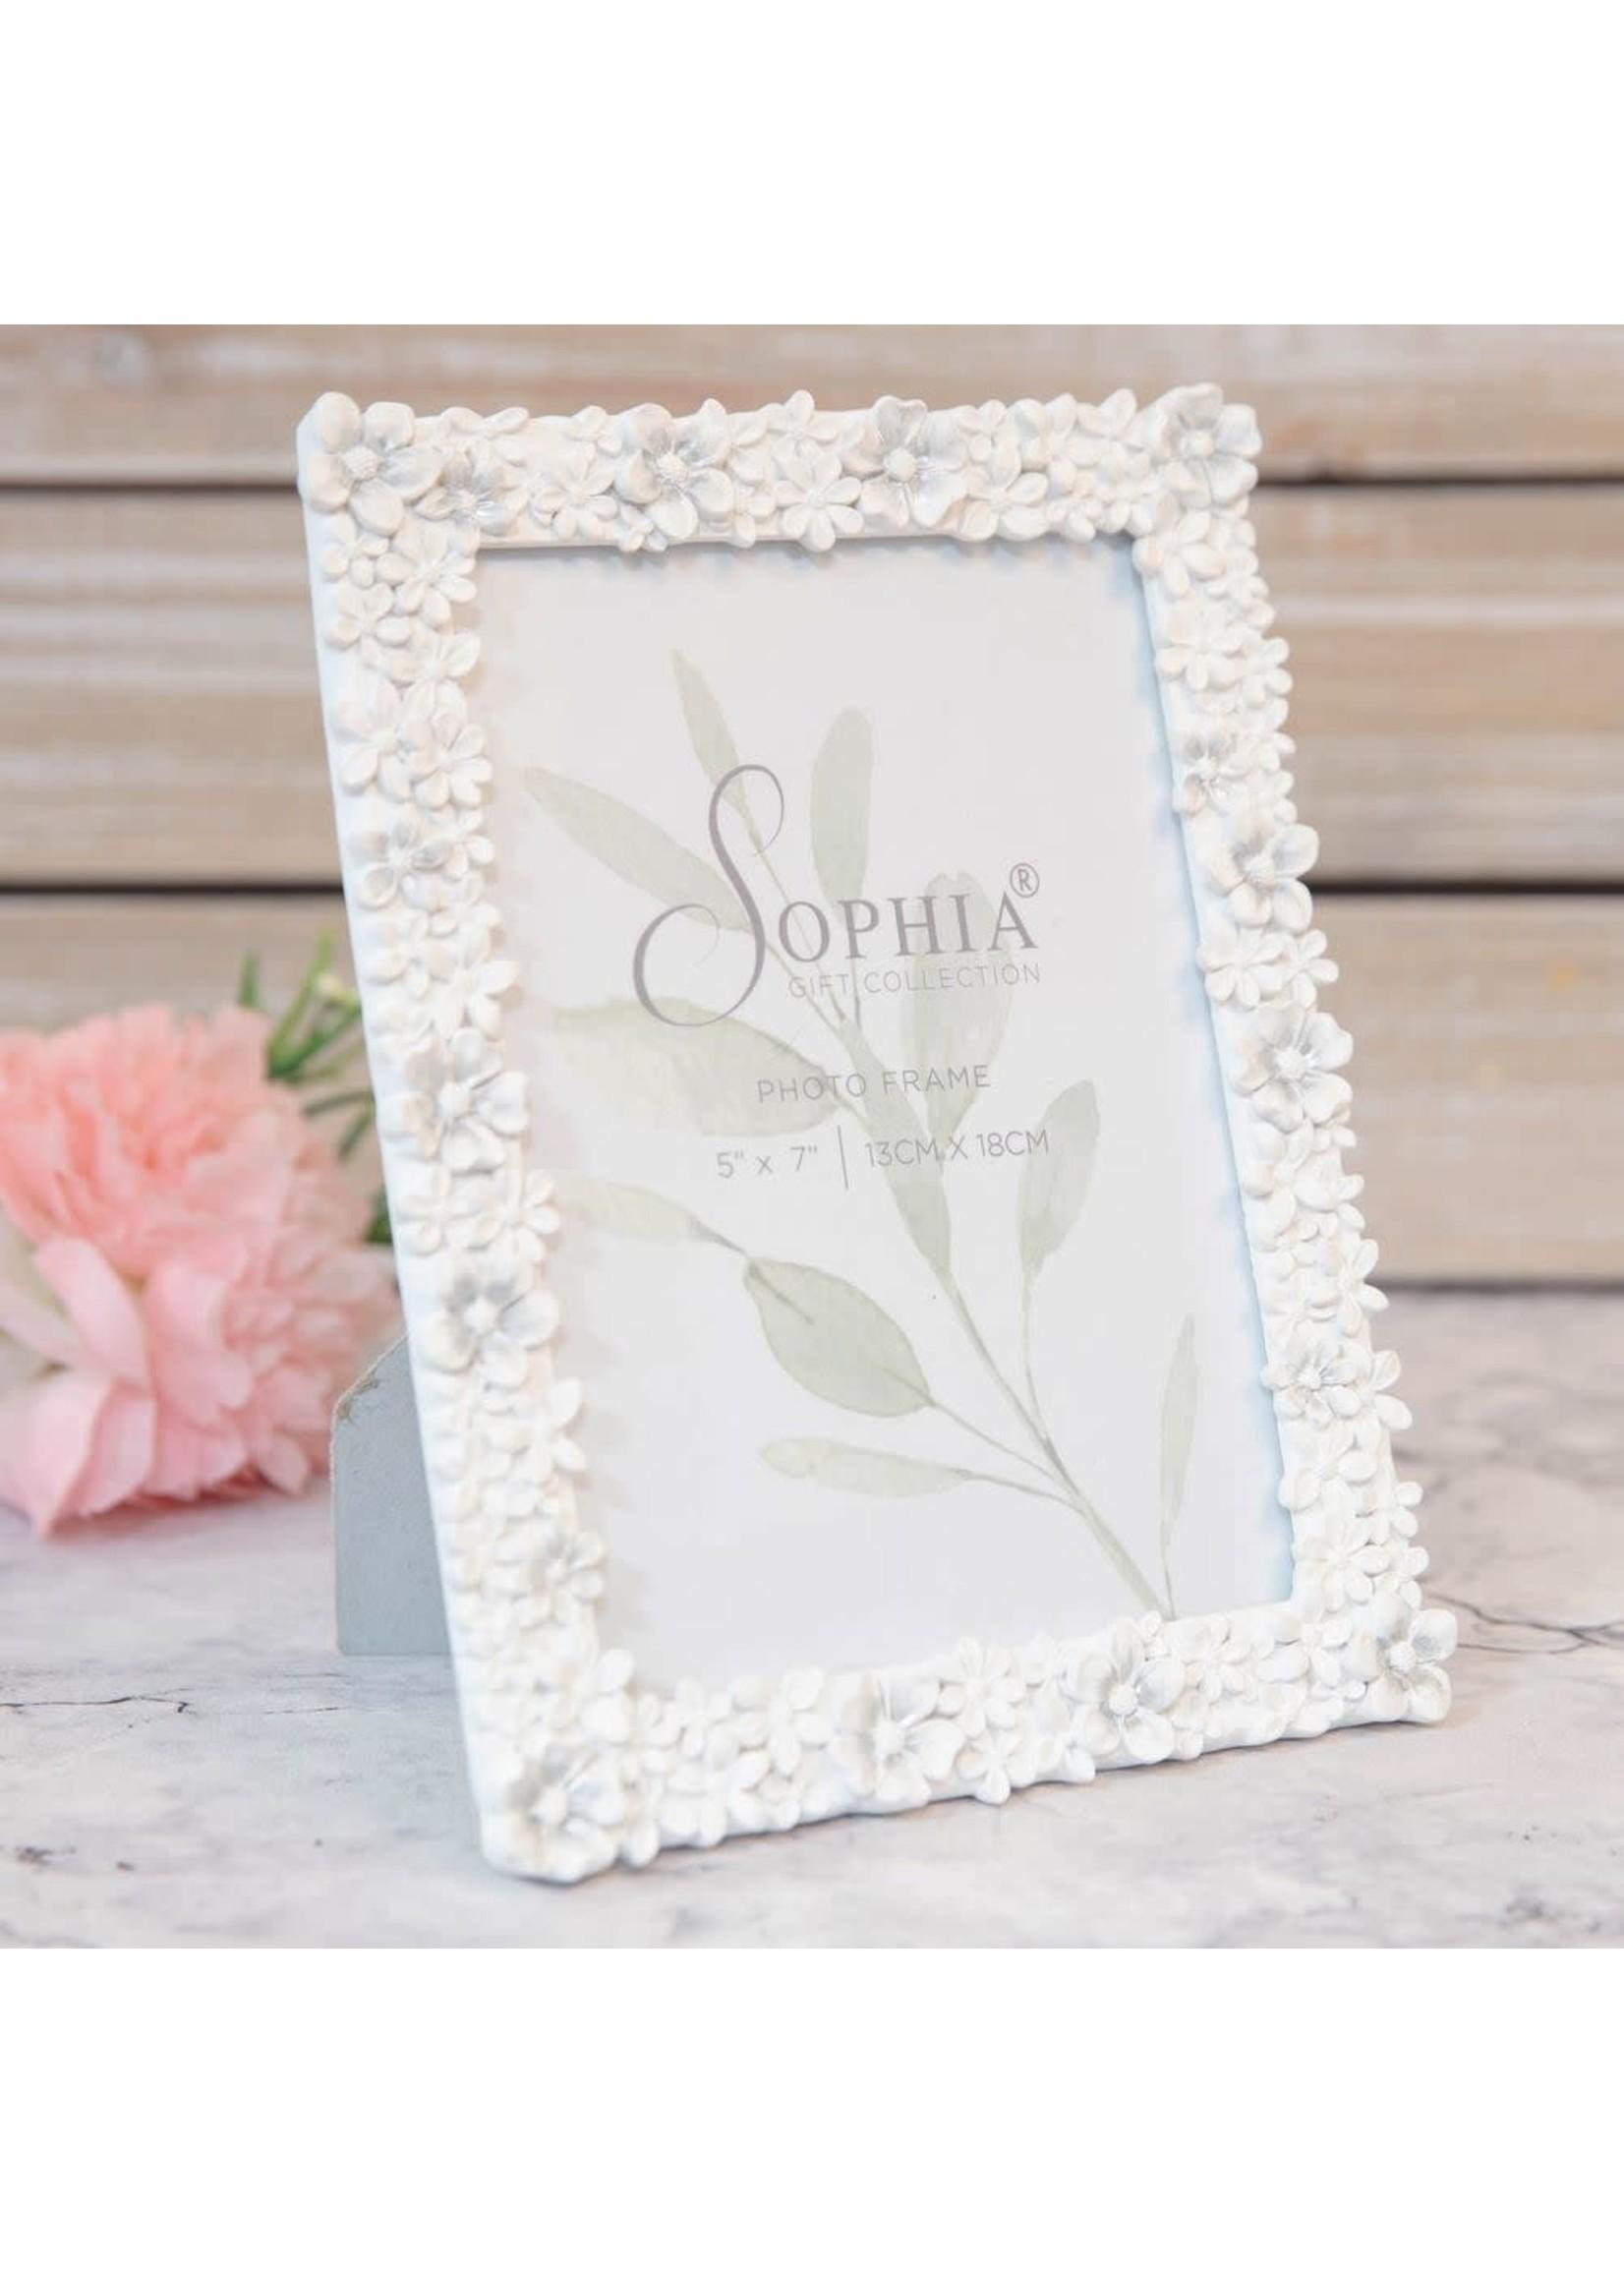 "5"" X 7"" - SOPHIA® WHITE FLORAL RESIN PHOTO FRAME"